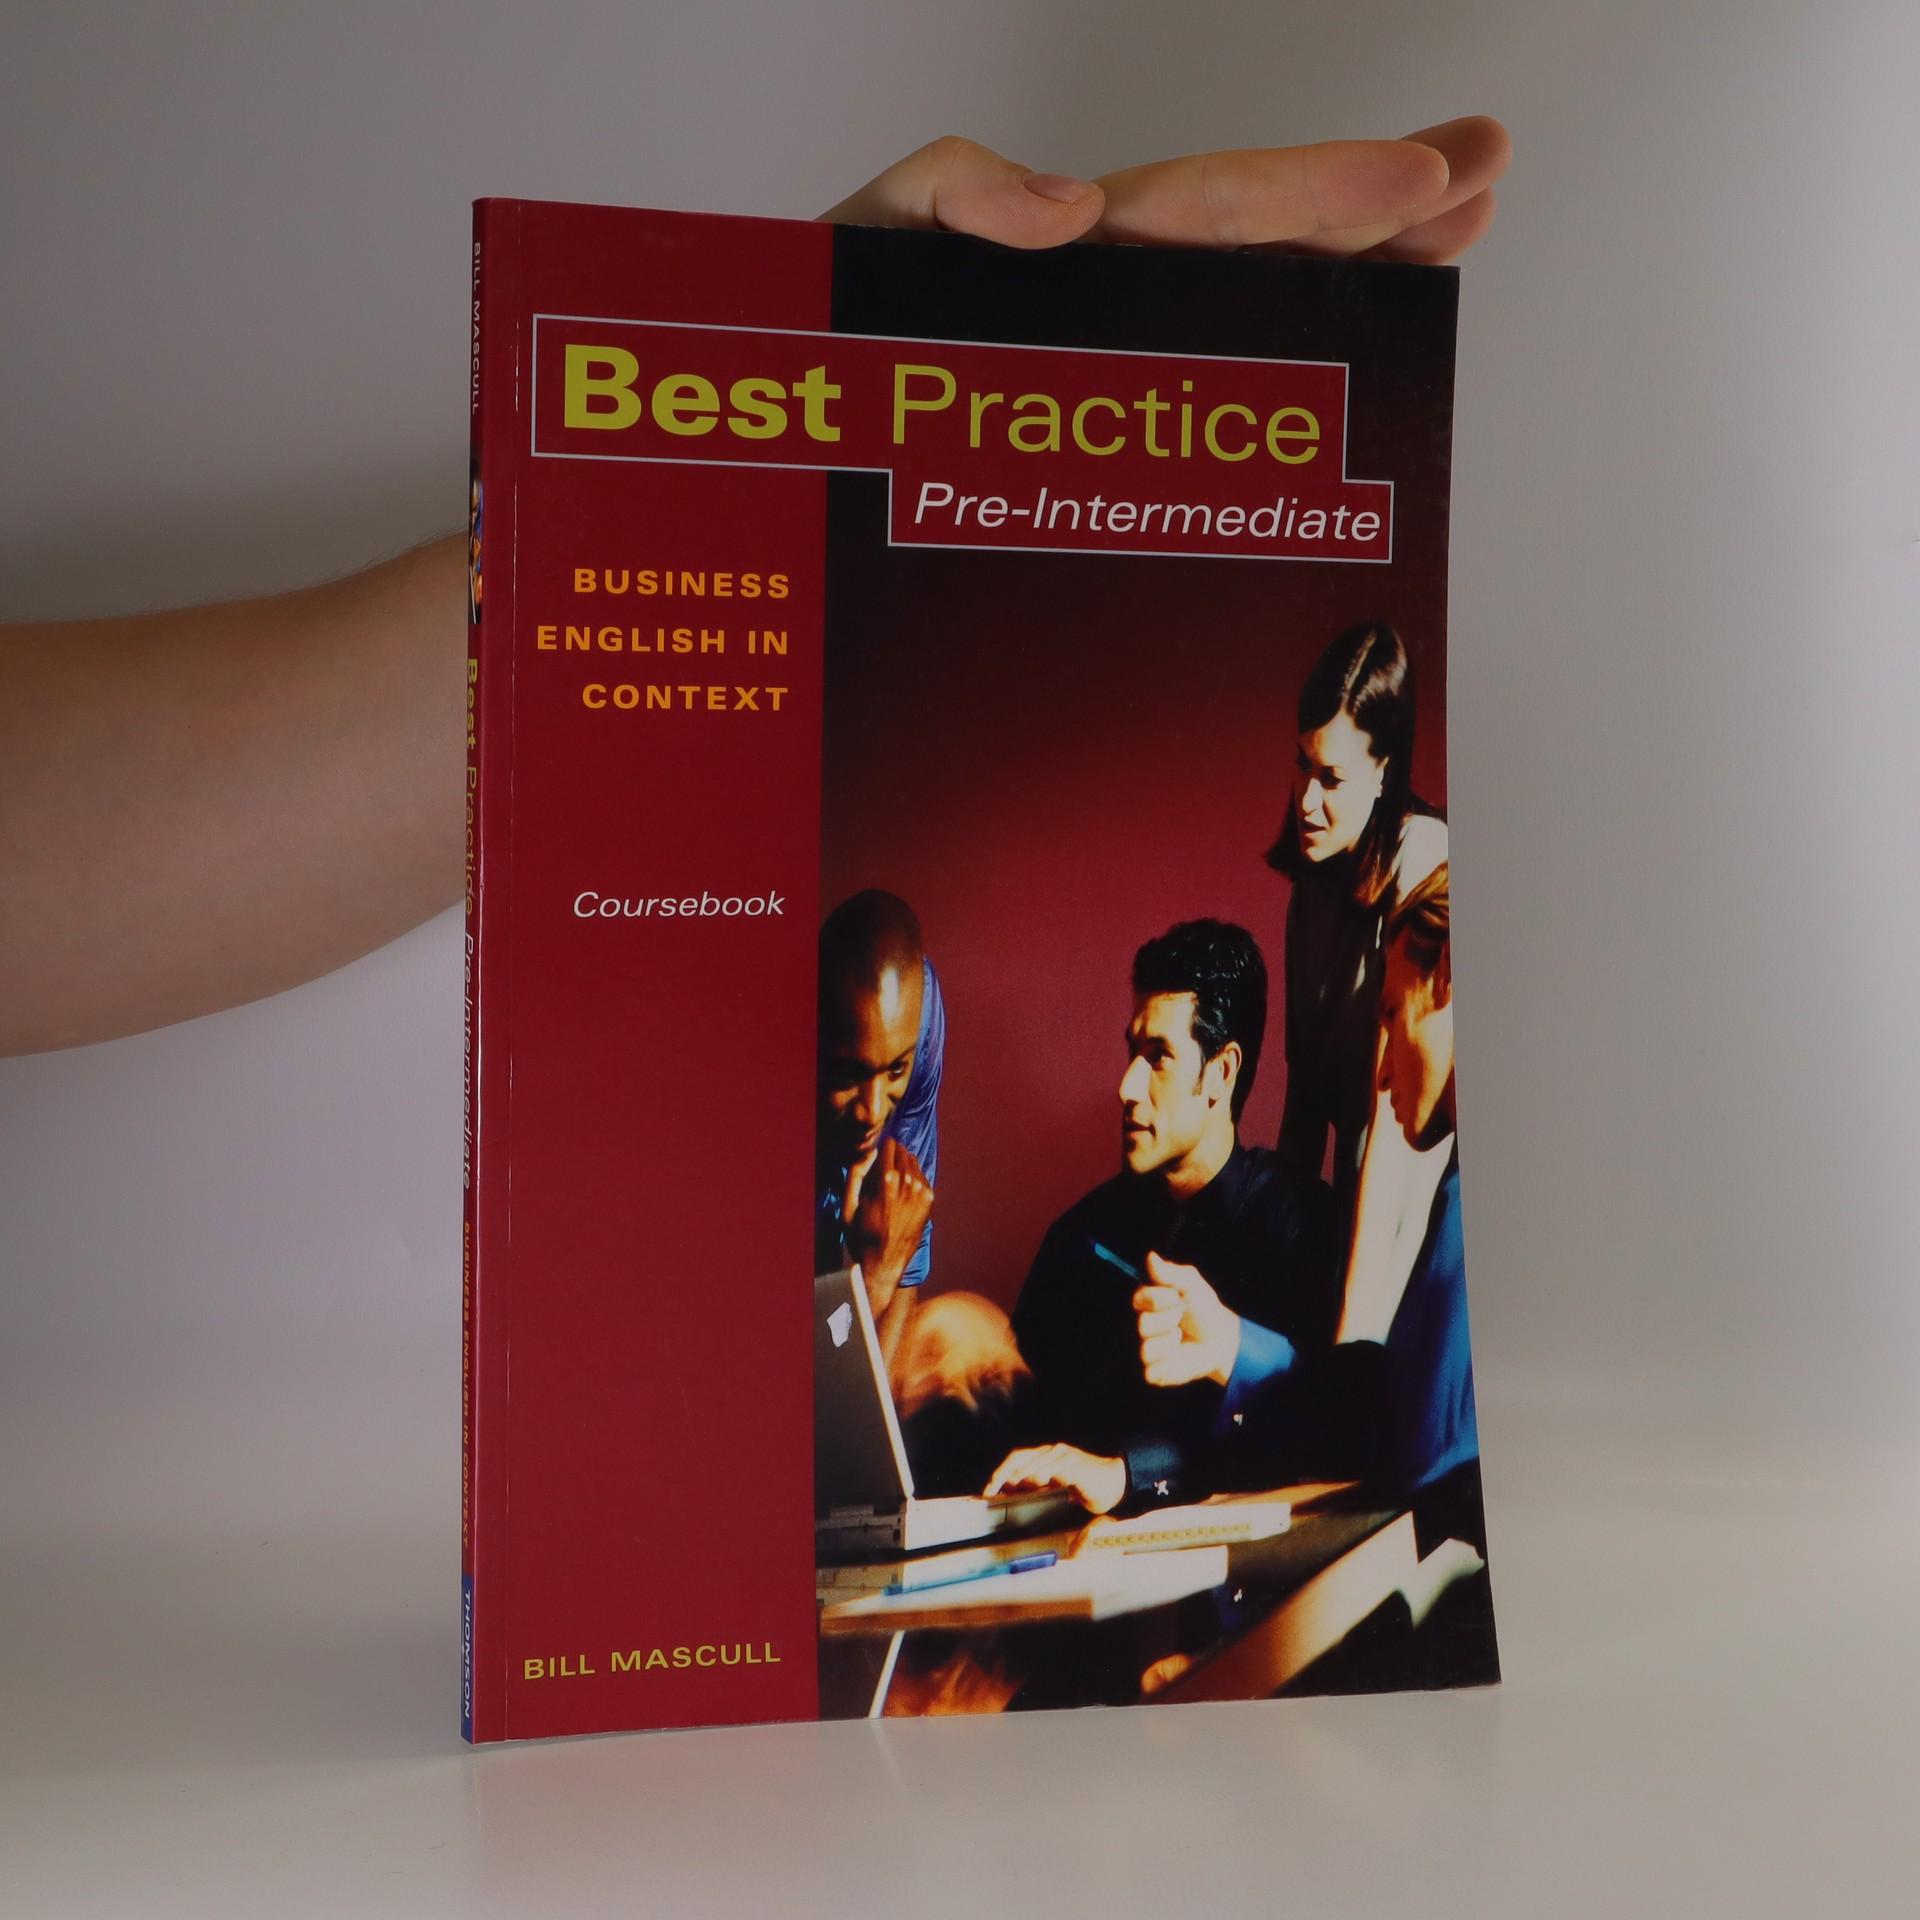 antikvární kniha Best practice. Coursebook. Business English in context. Pre-intermediate, neuveden